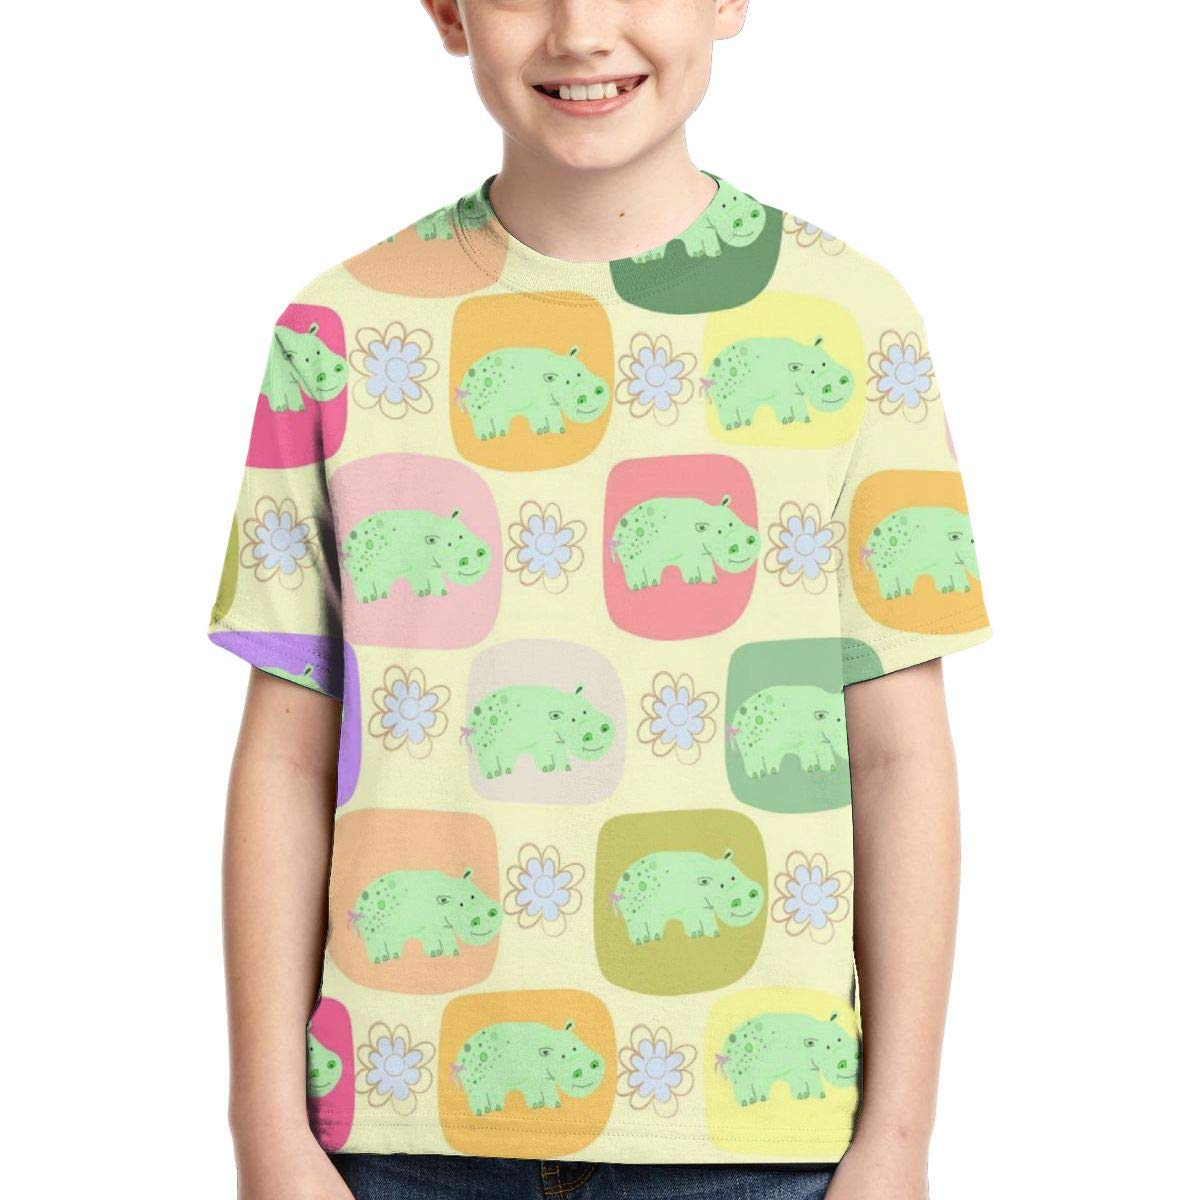 HHTZTCL Likely Cartoon Hippo Kids Print Graphic Tee Short Sleeve T-Shirt